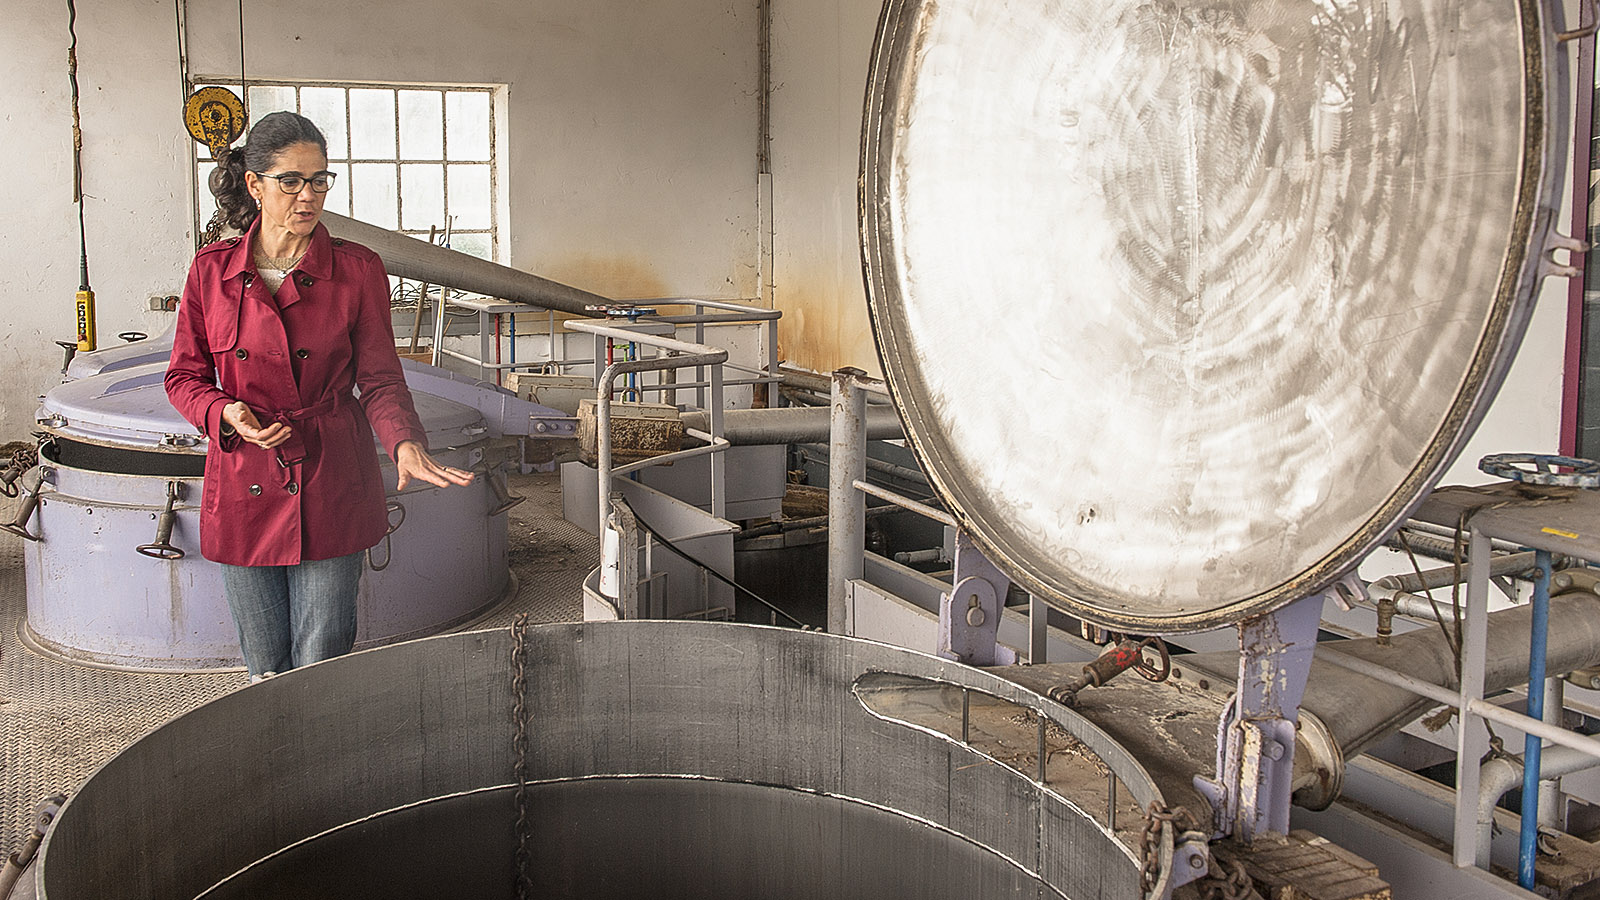 Lavendel: Véronique Agnels am Destillierkessel. Foto: Hilke Maunder